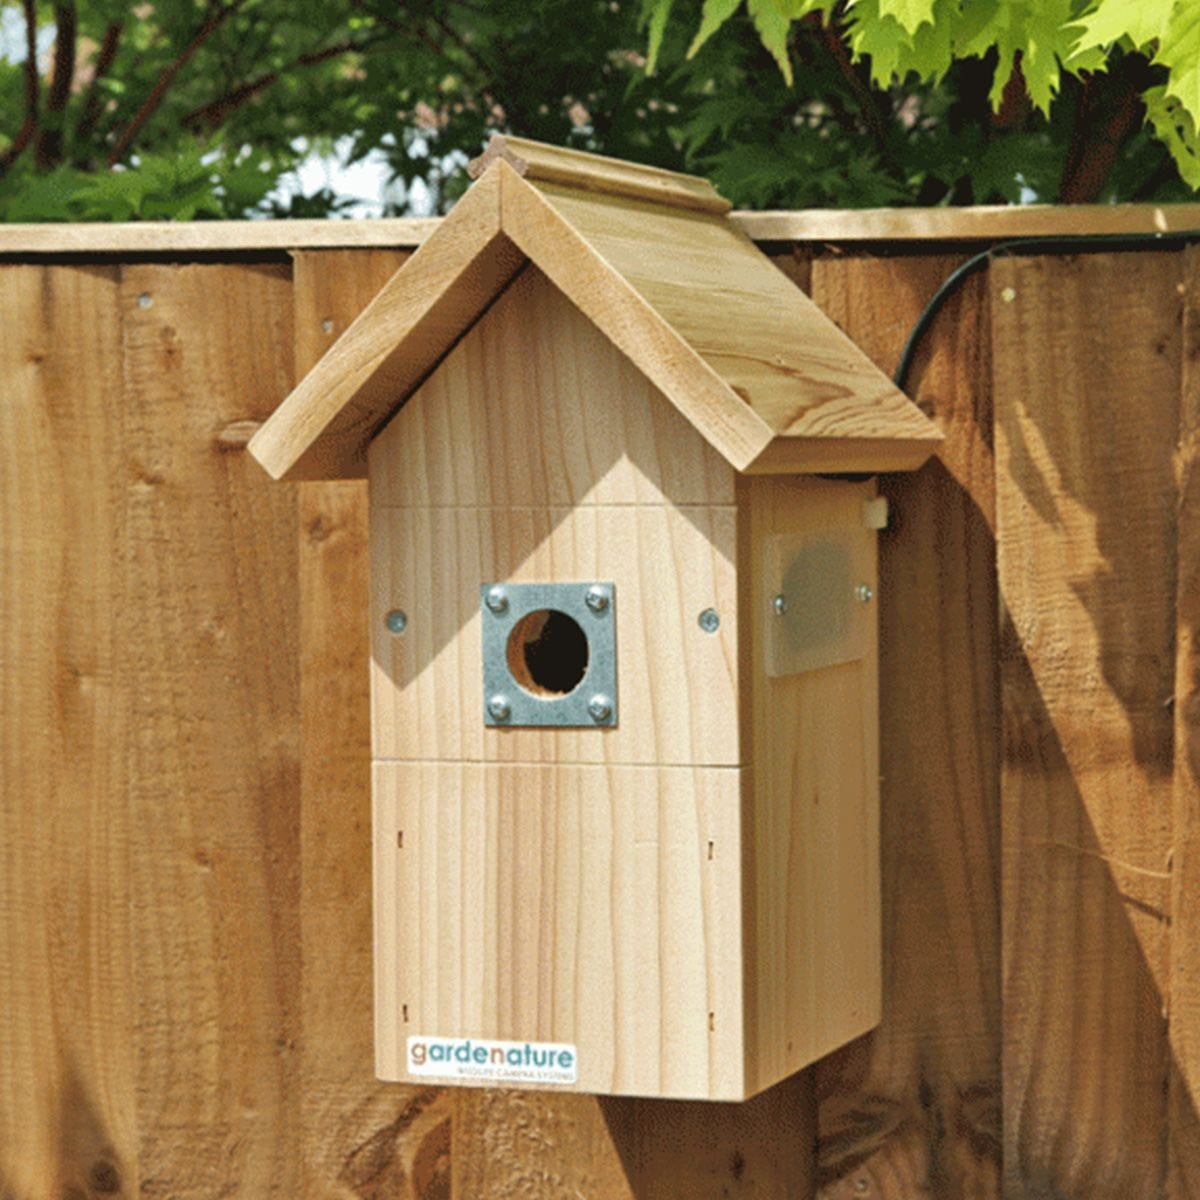 Gardenature Bird Box & Feeder Camera System